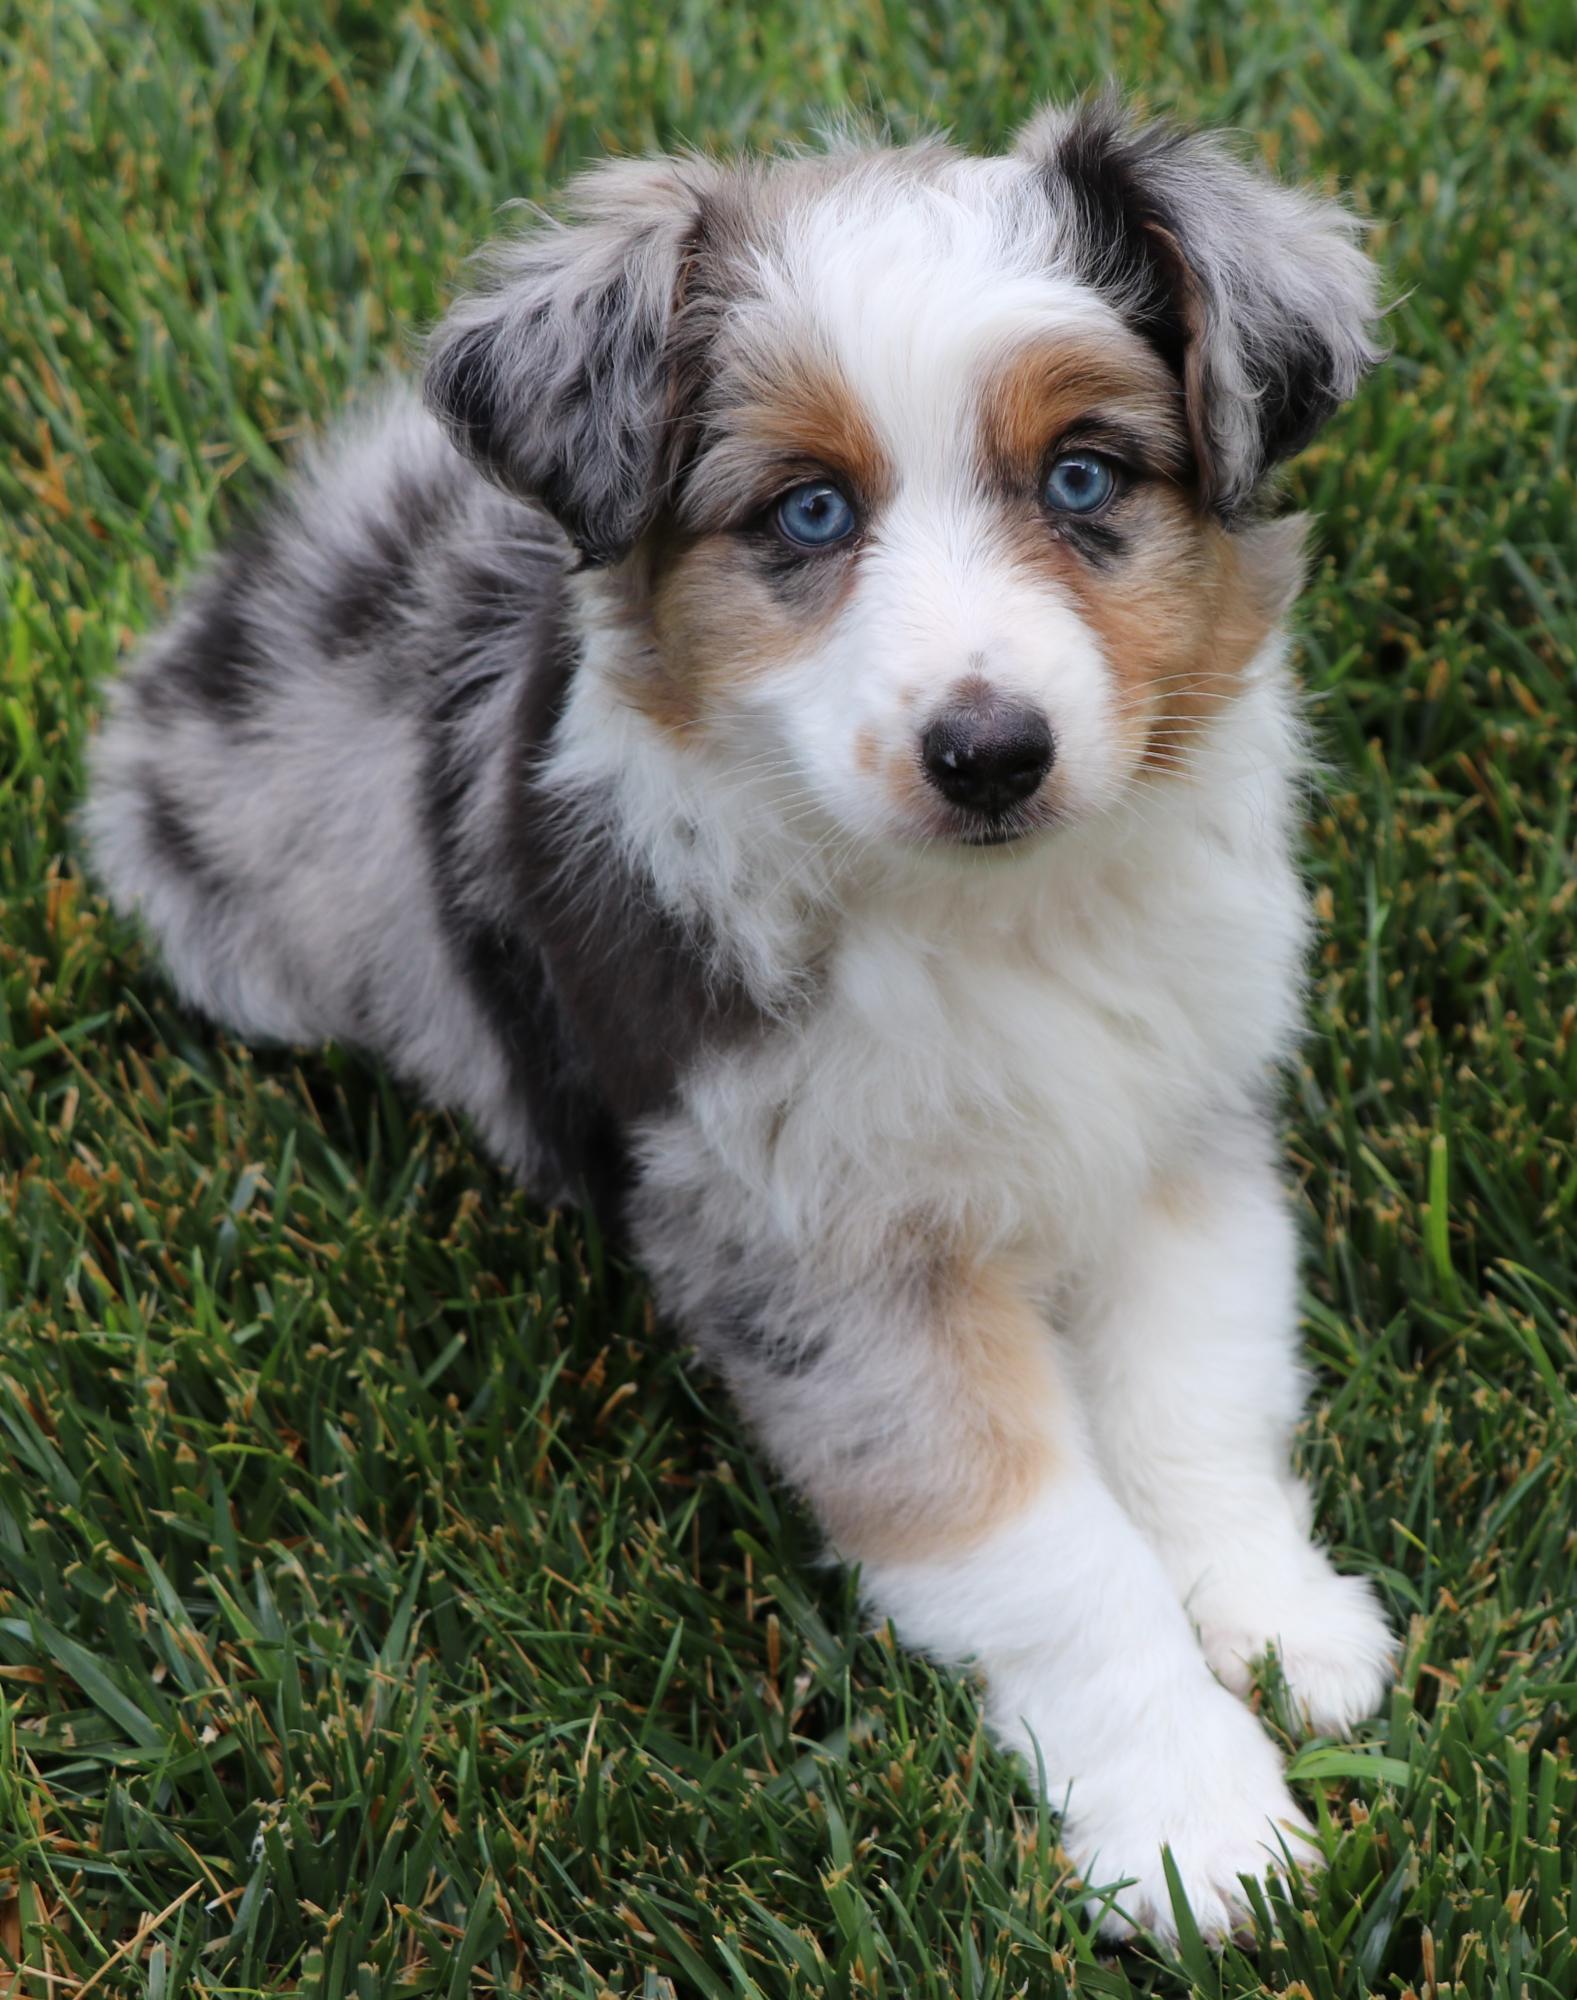 Toy Australian Shepherd puppies for sale in CO, Toy Aussie puppies